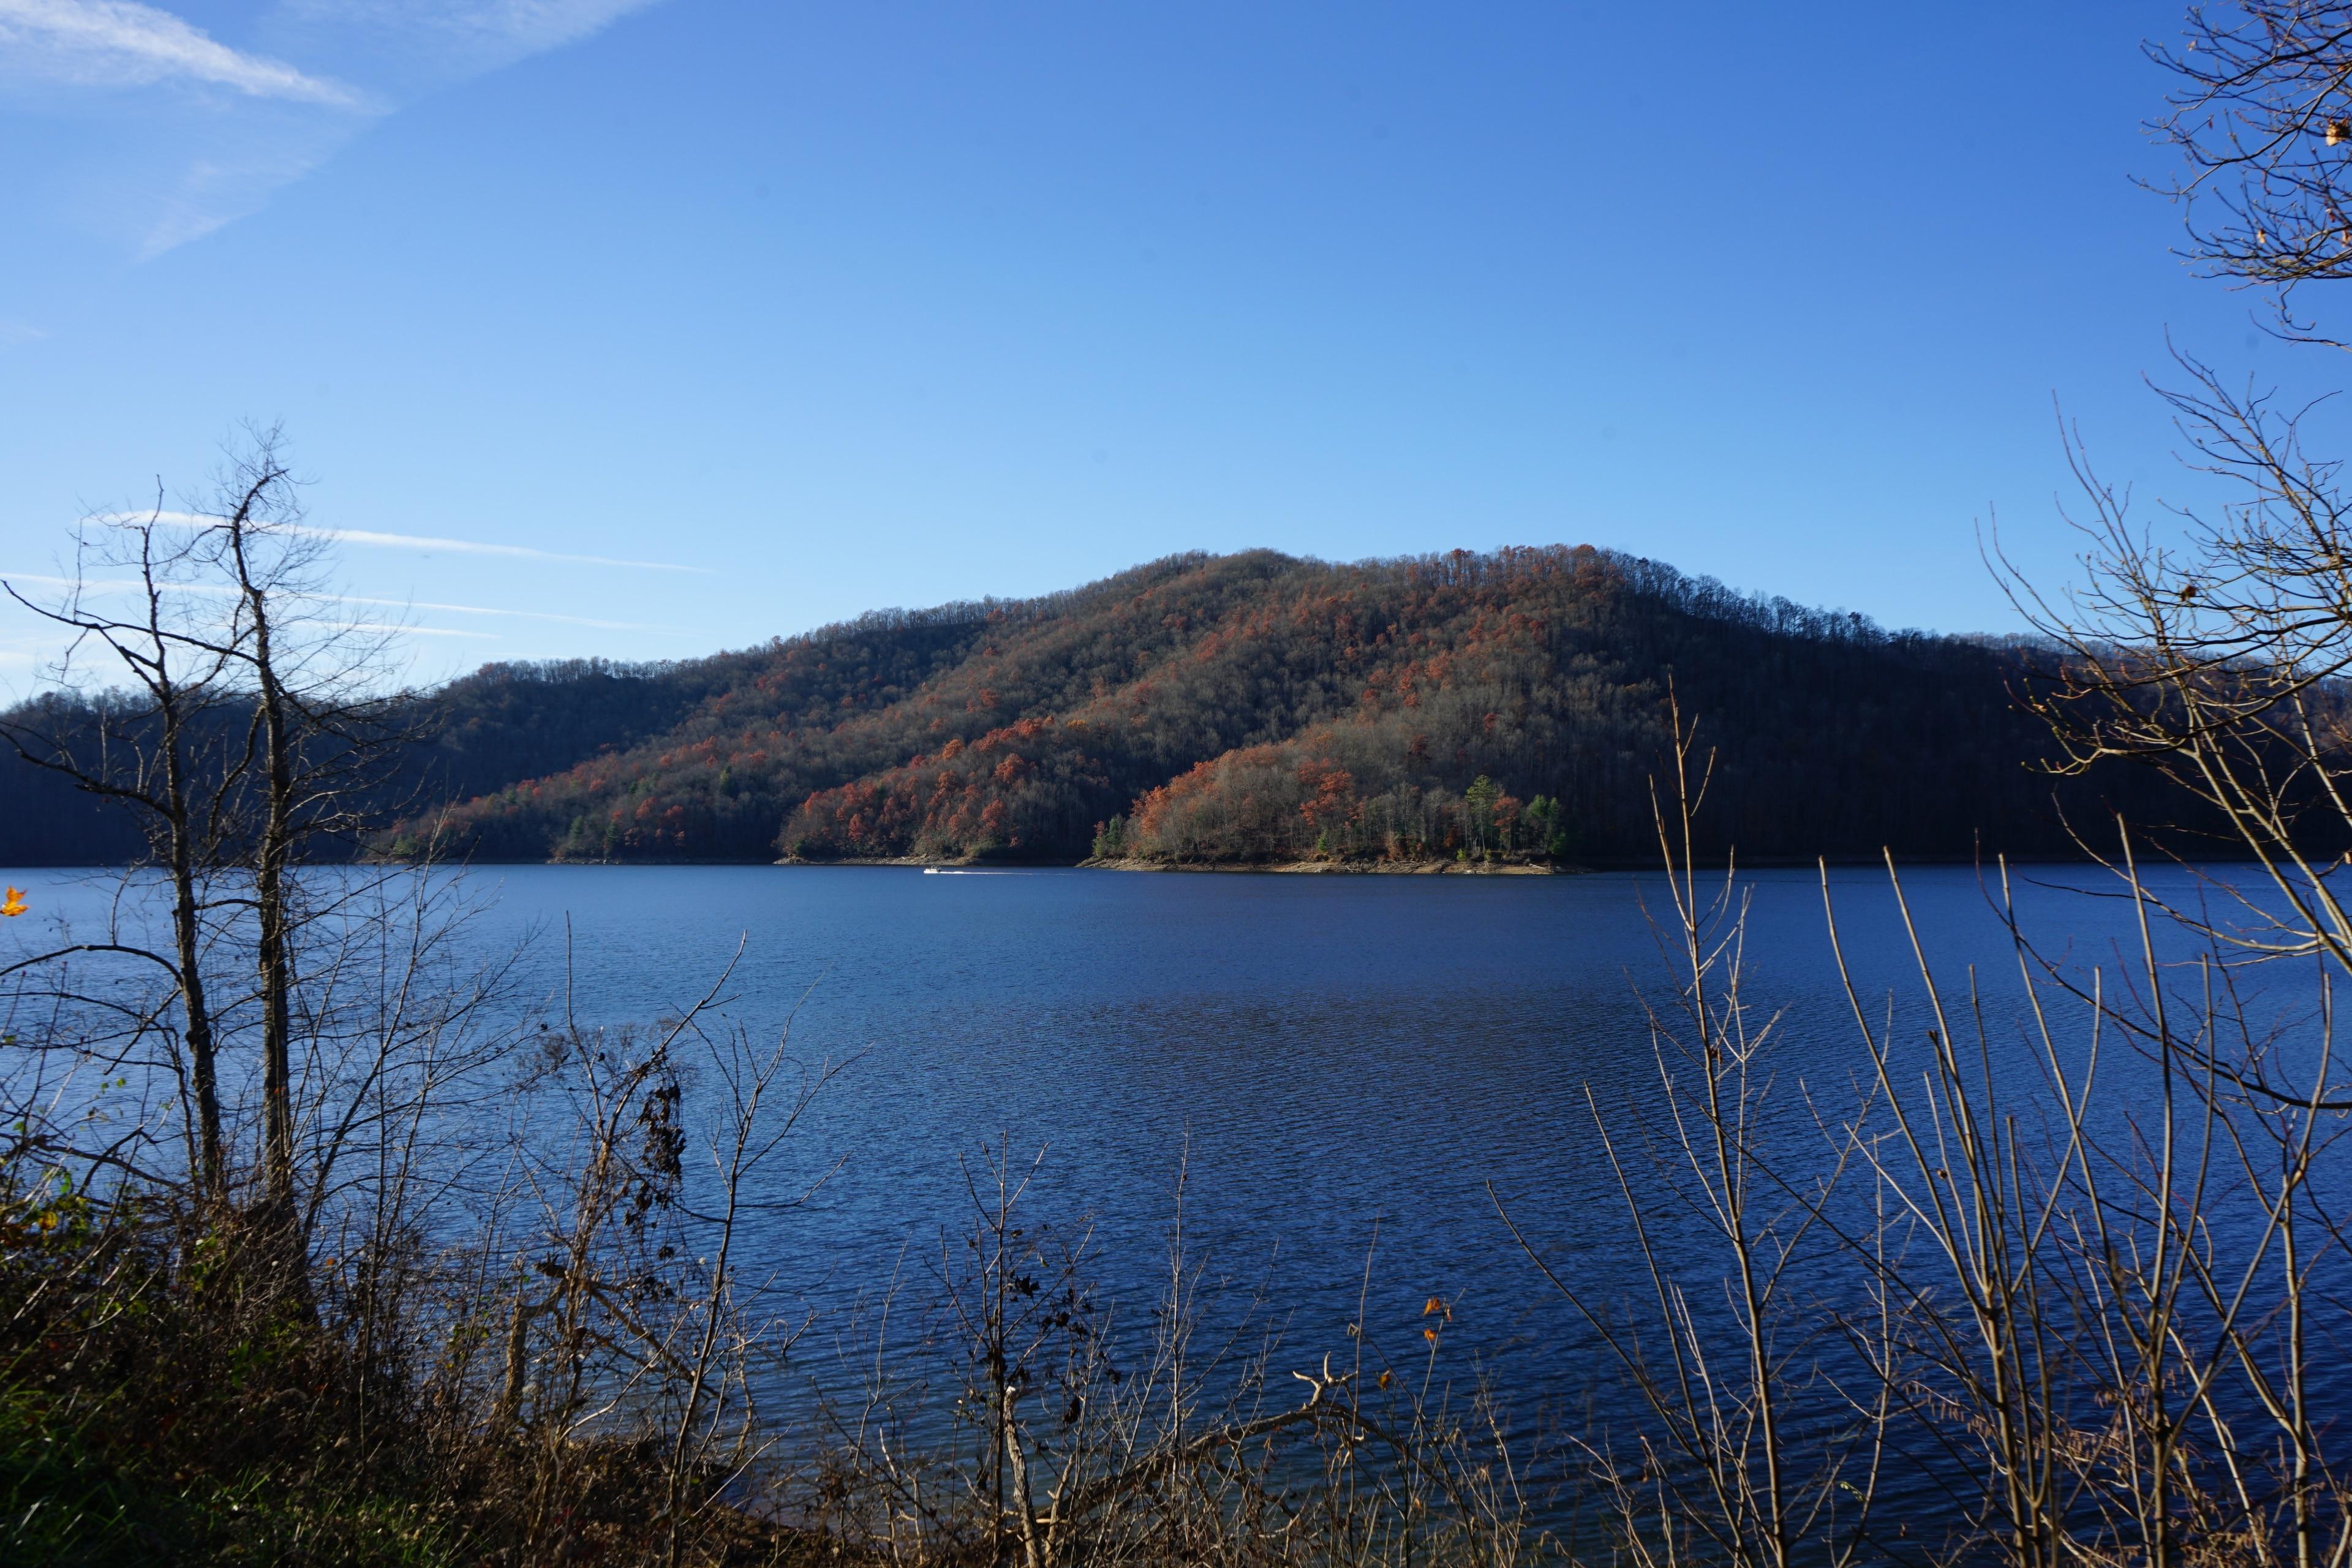 Nantahala Lake, Topton, North Carolina, United States of America